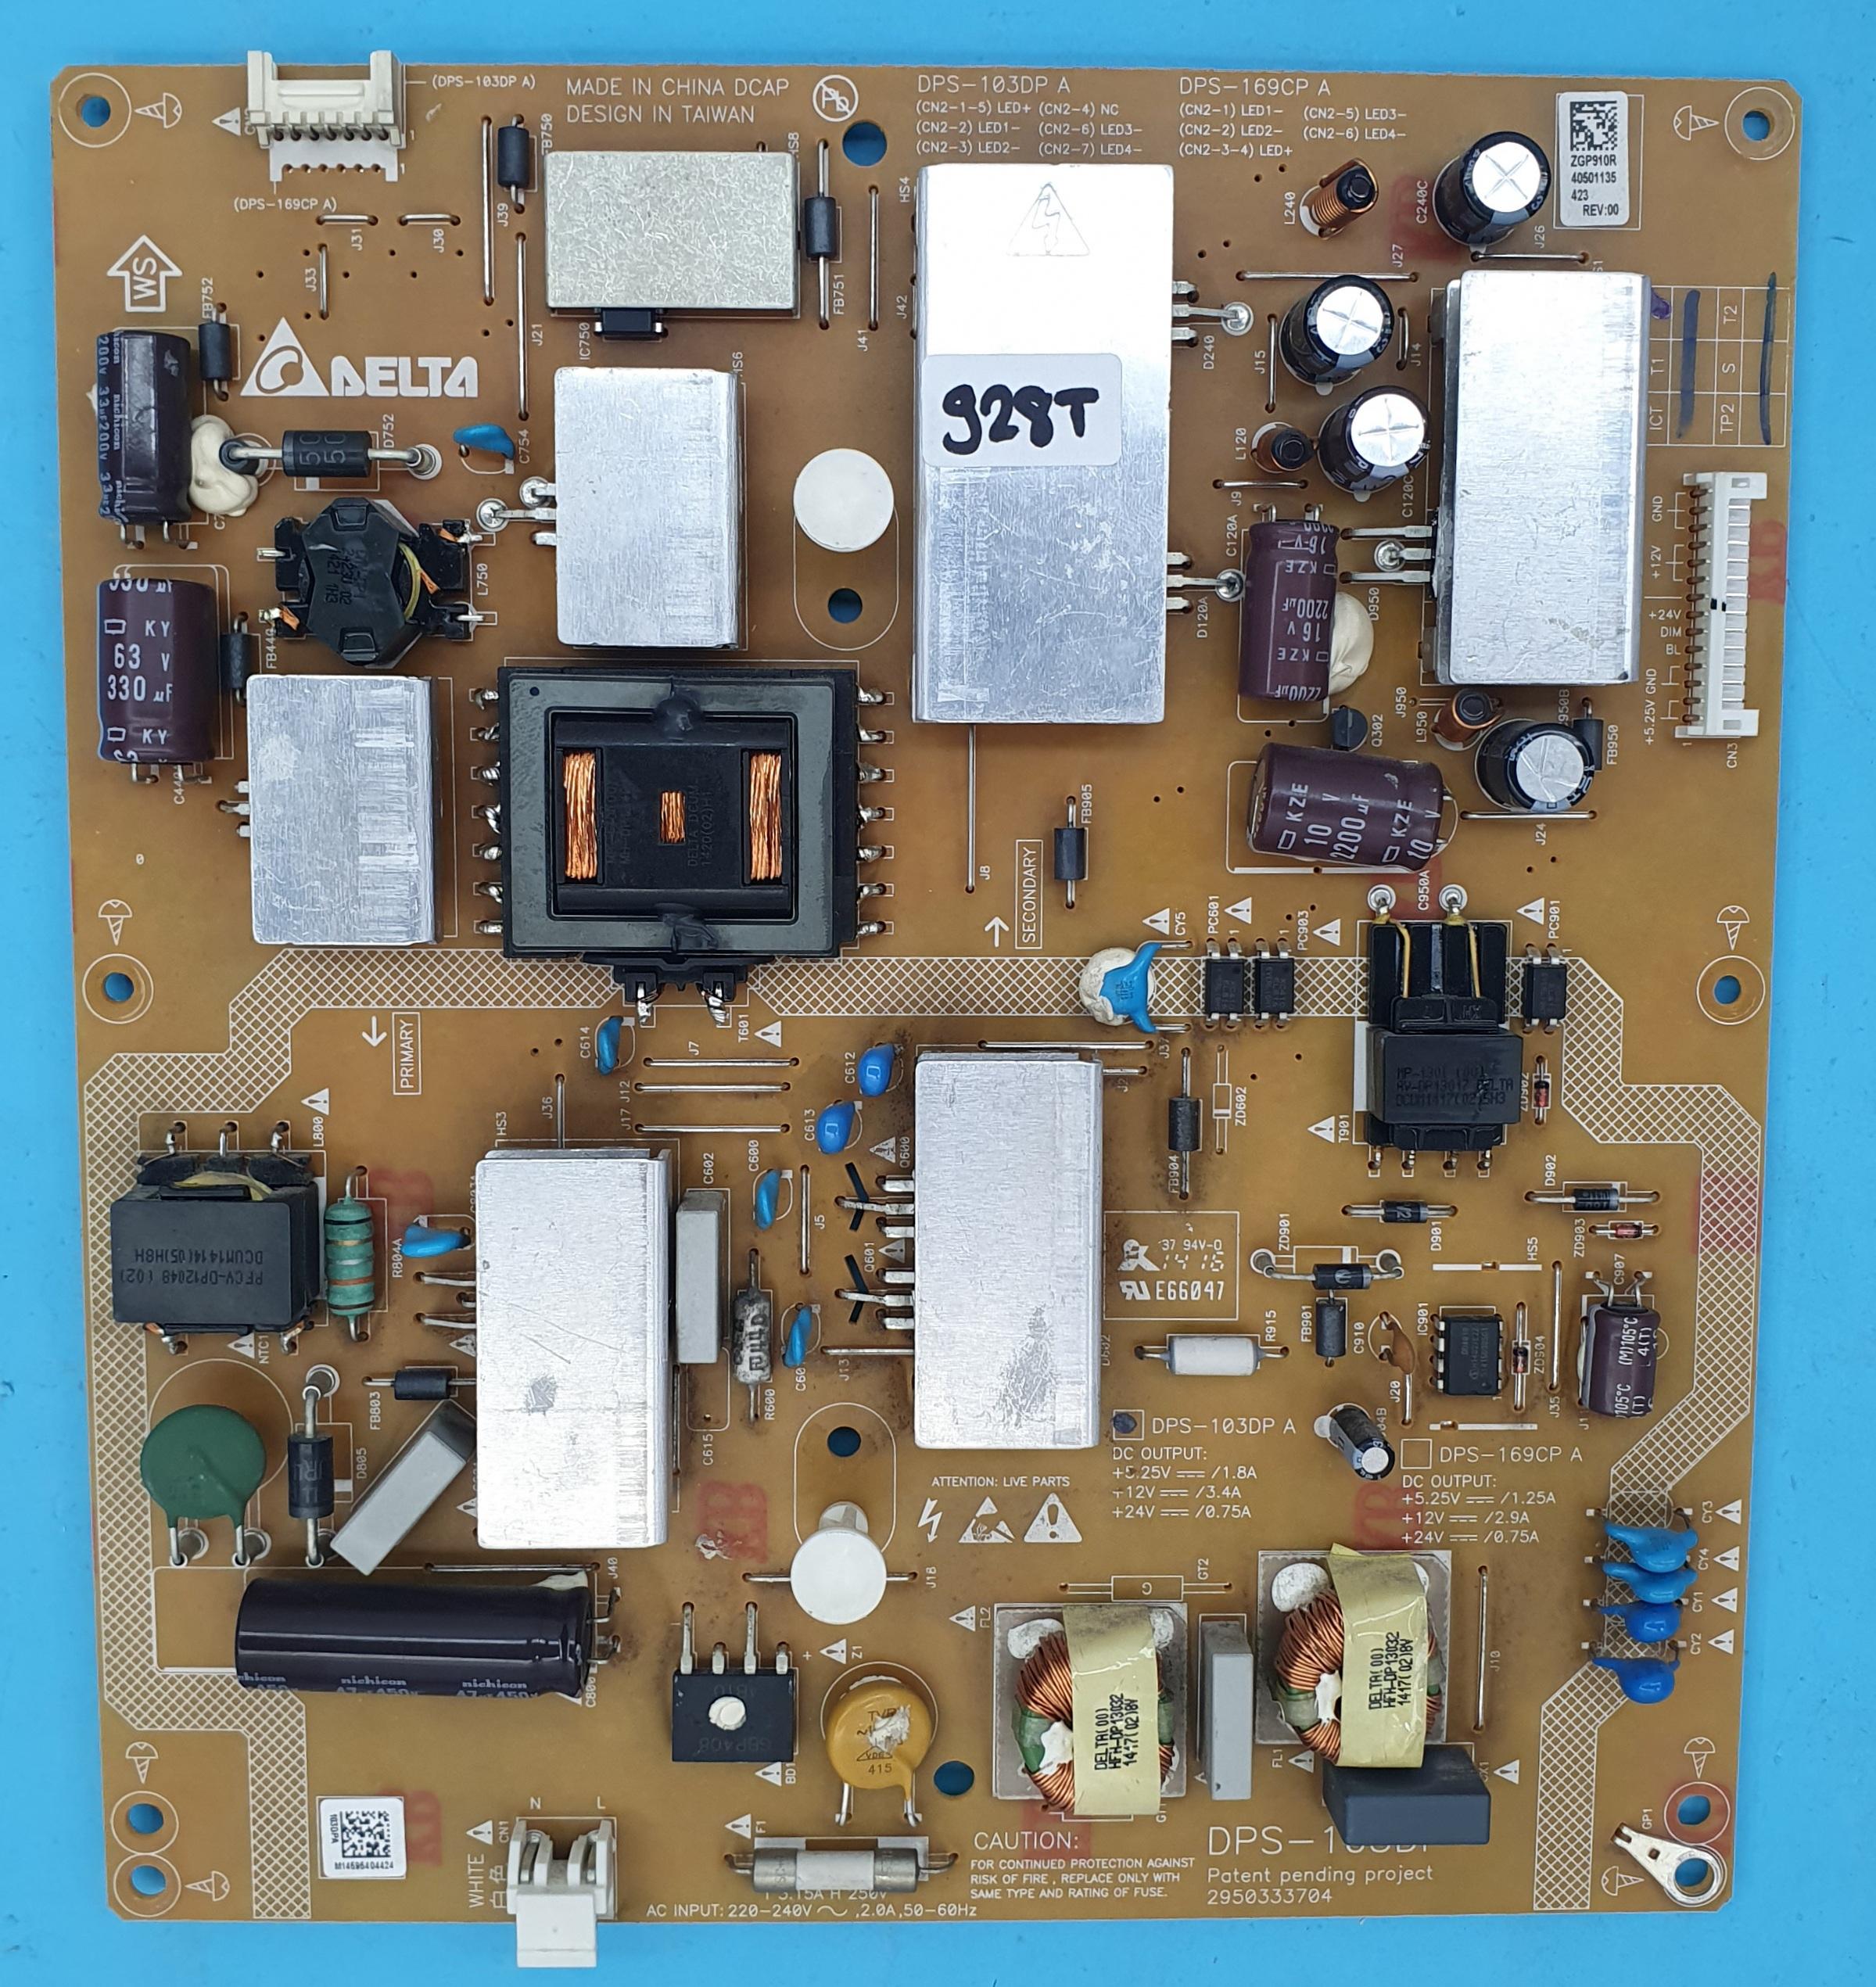 DPS-103DP,2950333704 PHILIPS Power (KDV DAHİL = 177 TL)